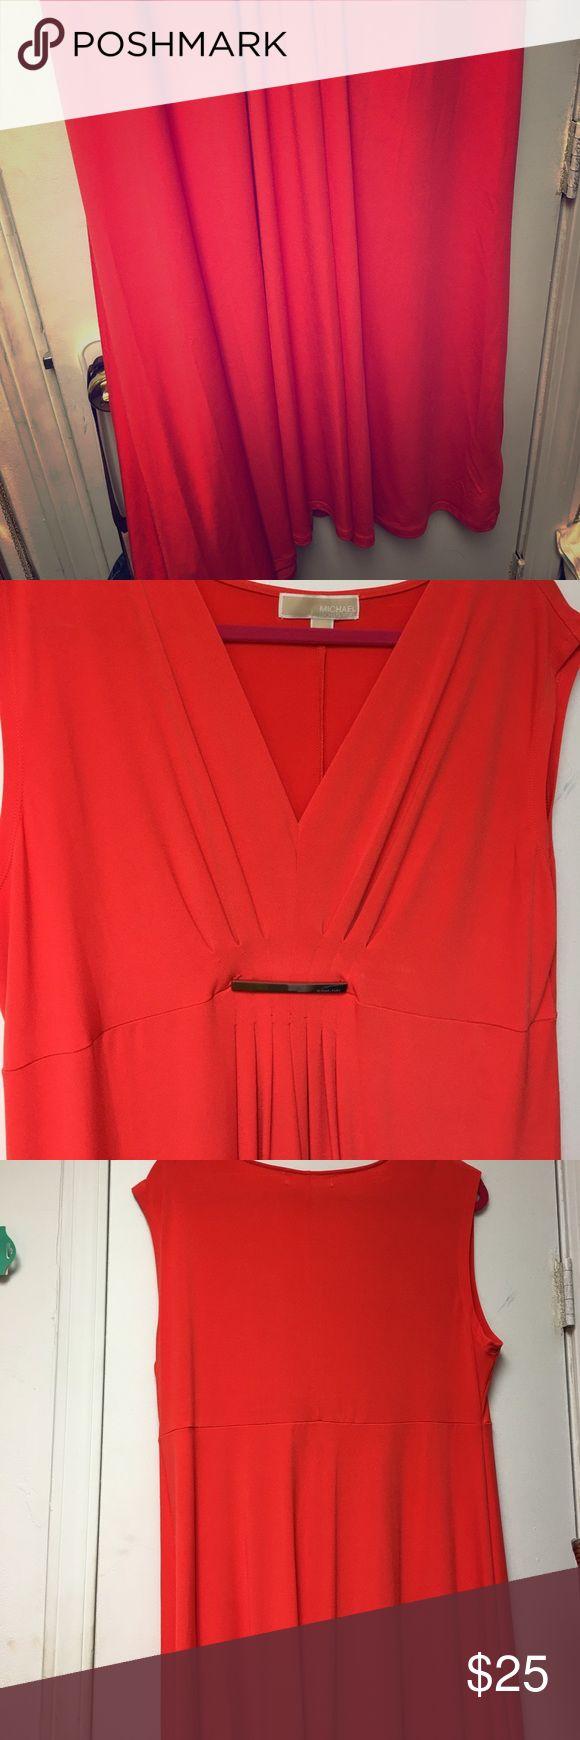 Beautiful orange maxi dress Worn once beautiful orange maxi dress. Michael kors XL Michael Kors Dresses Maxi